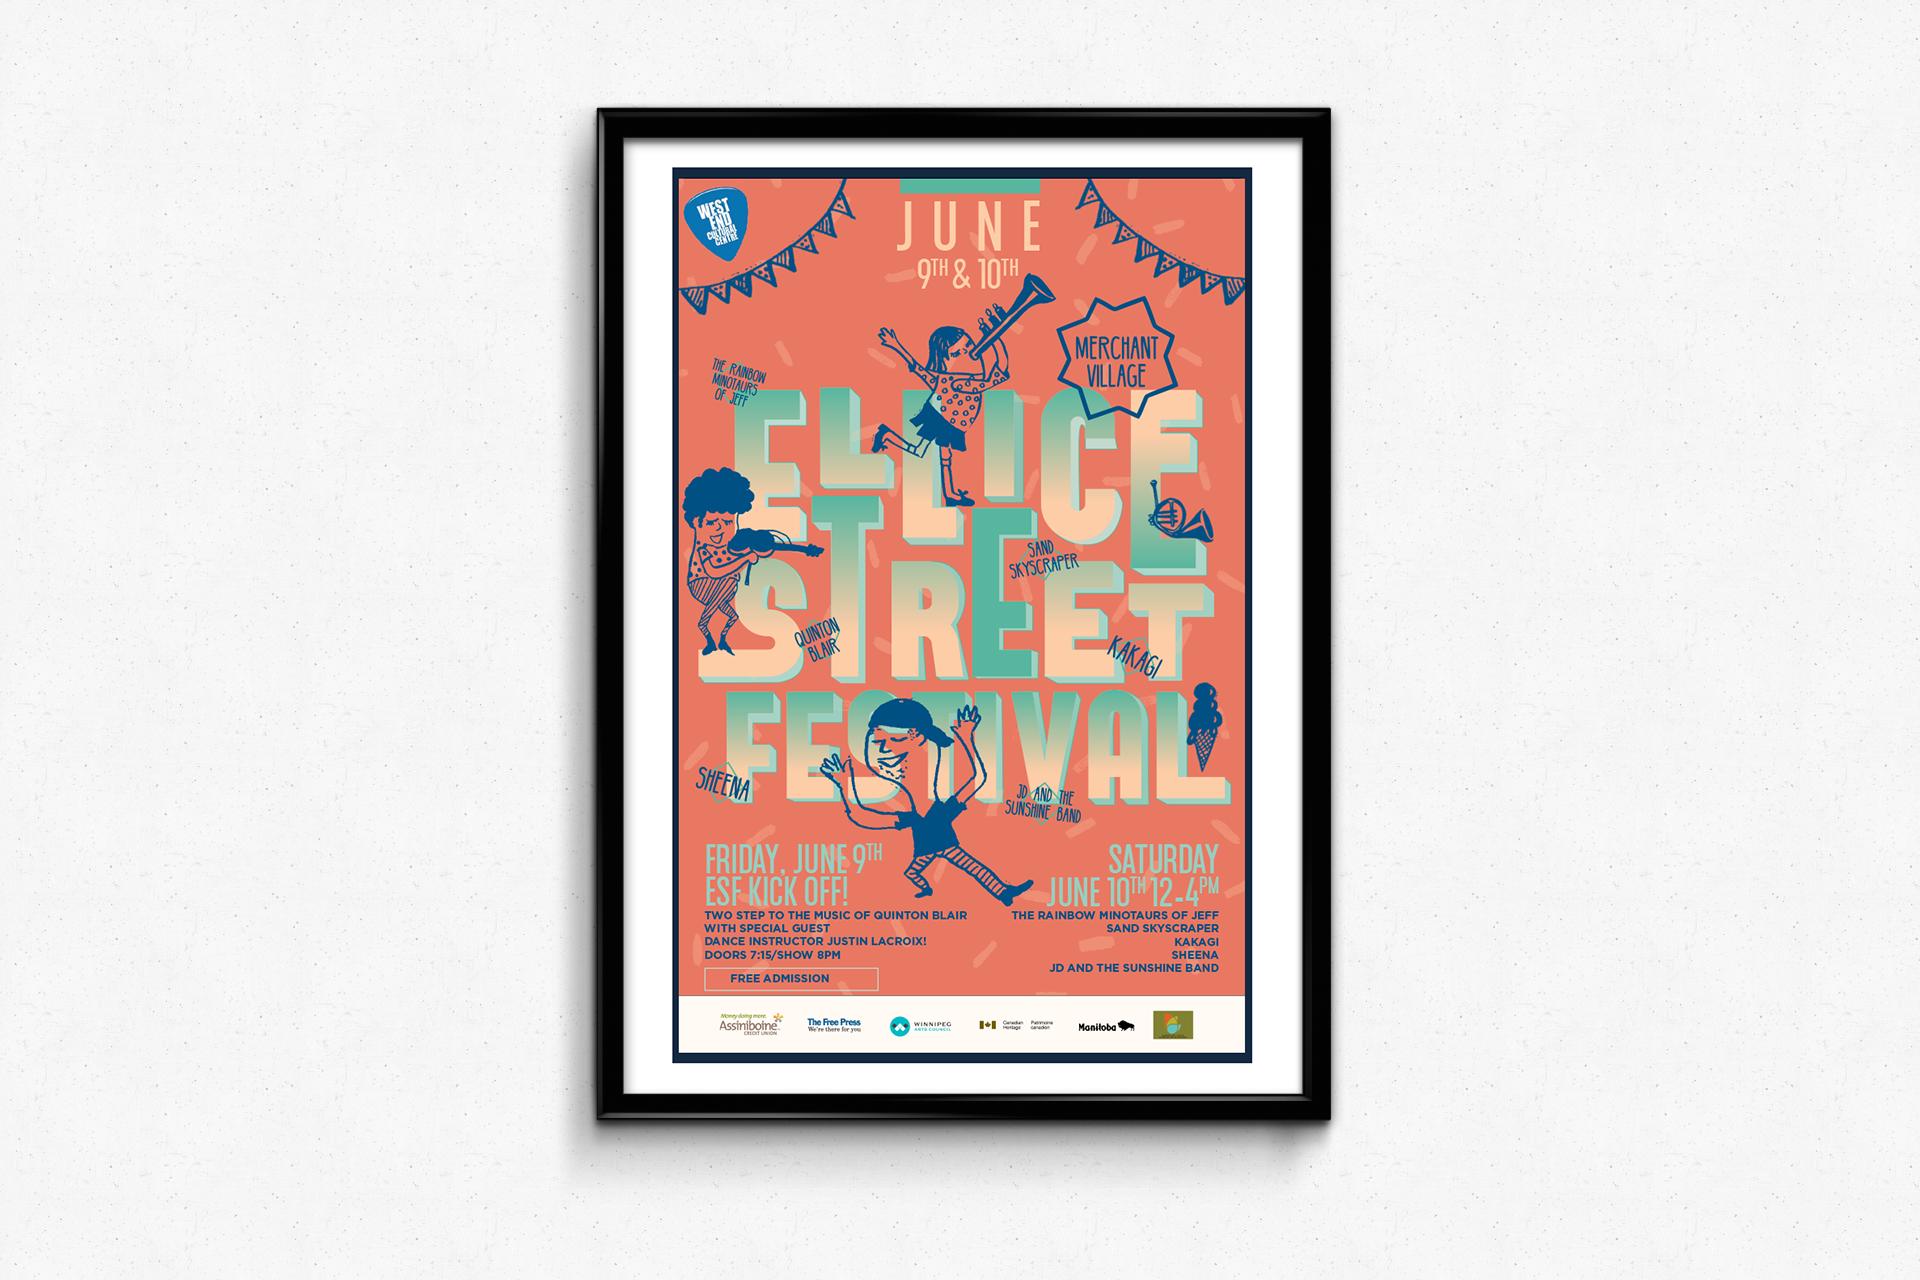 WECC — Ellice Street Festival